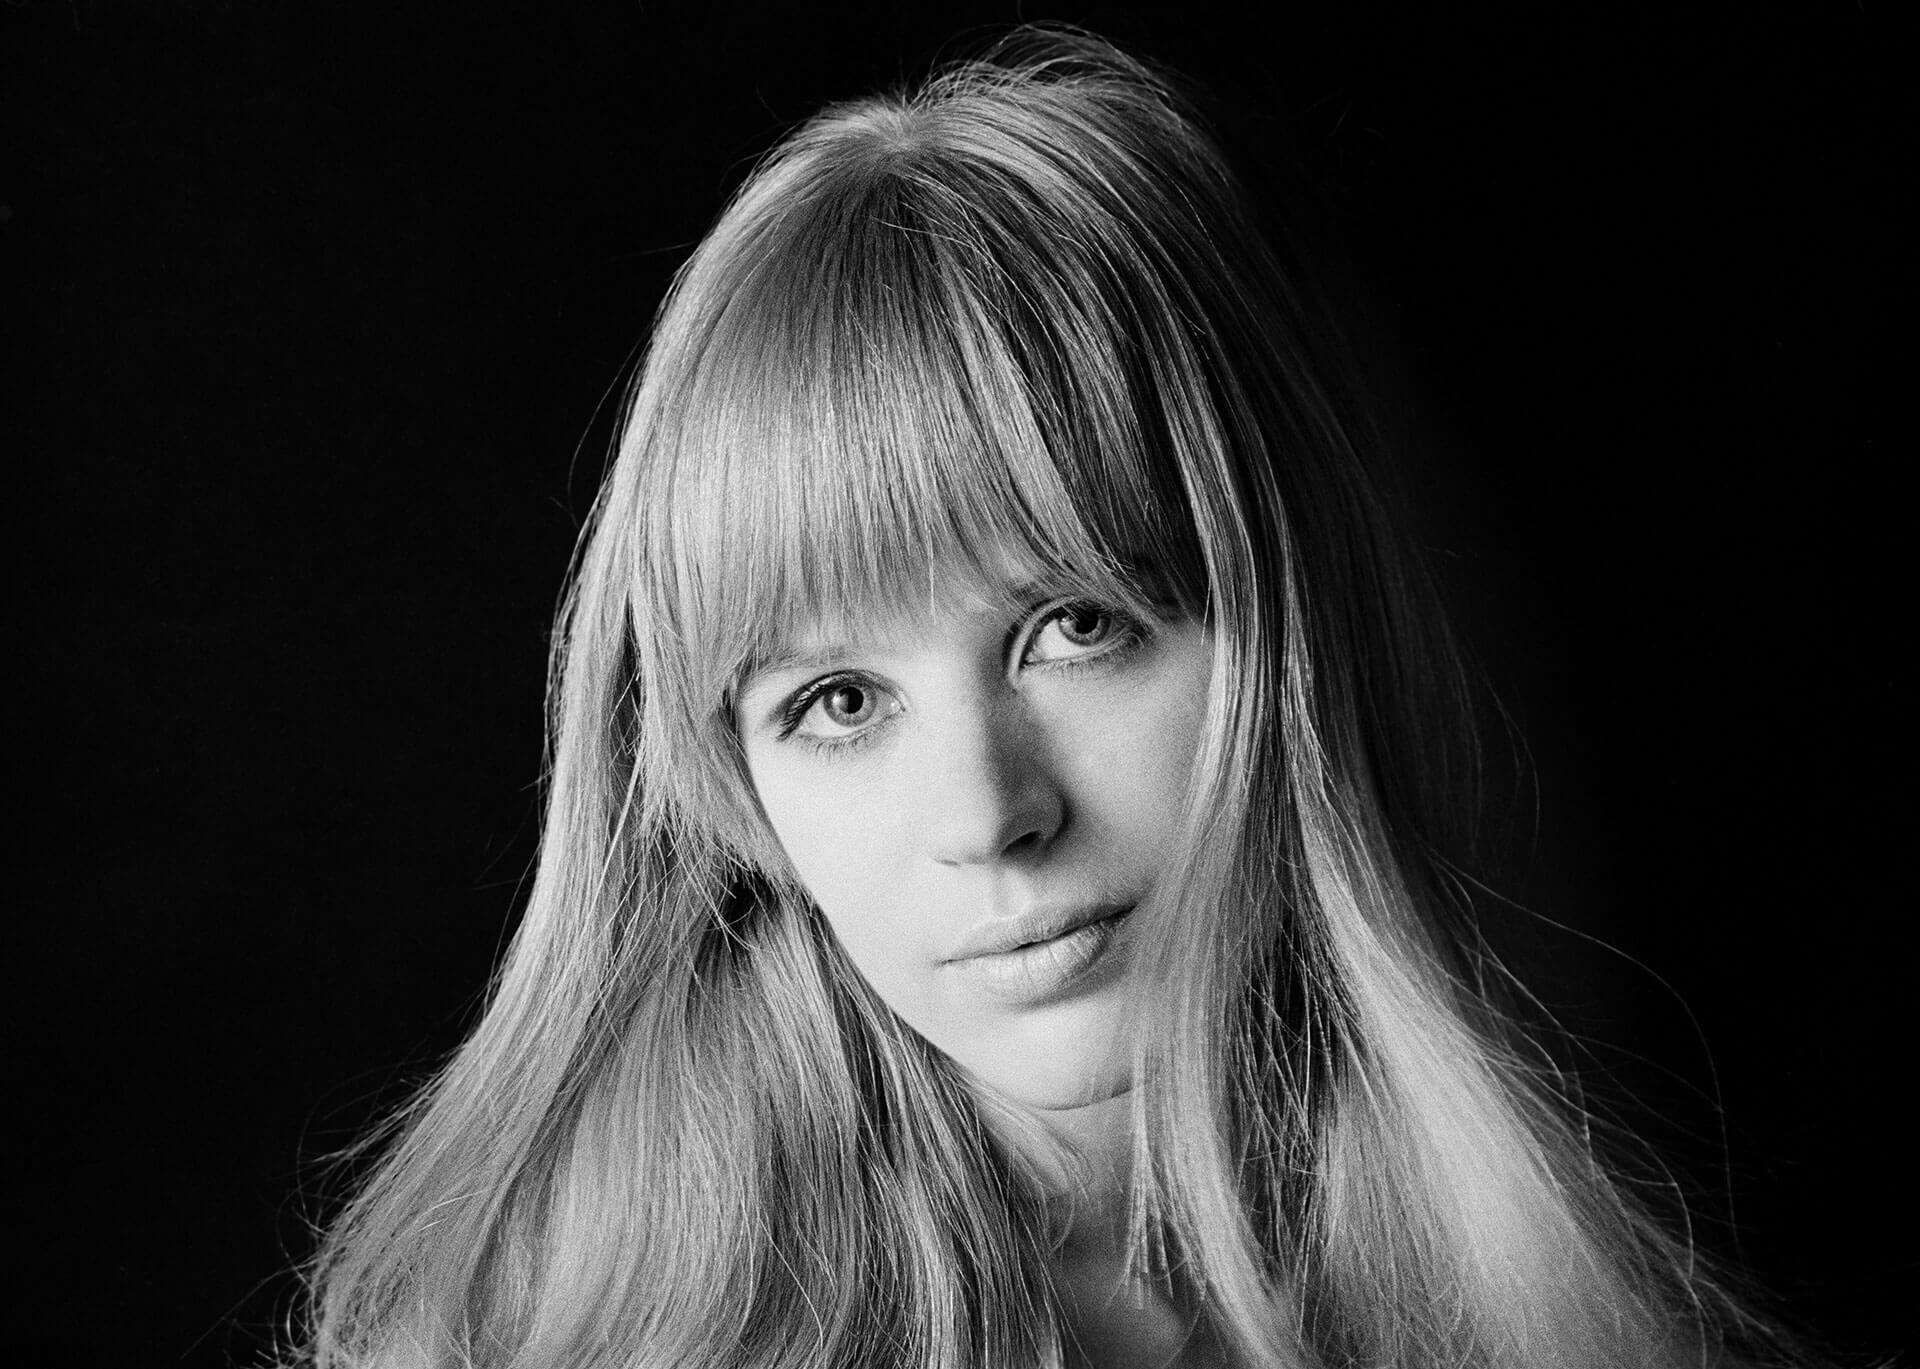 Marianne Faithfull 1964 Print